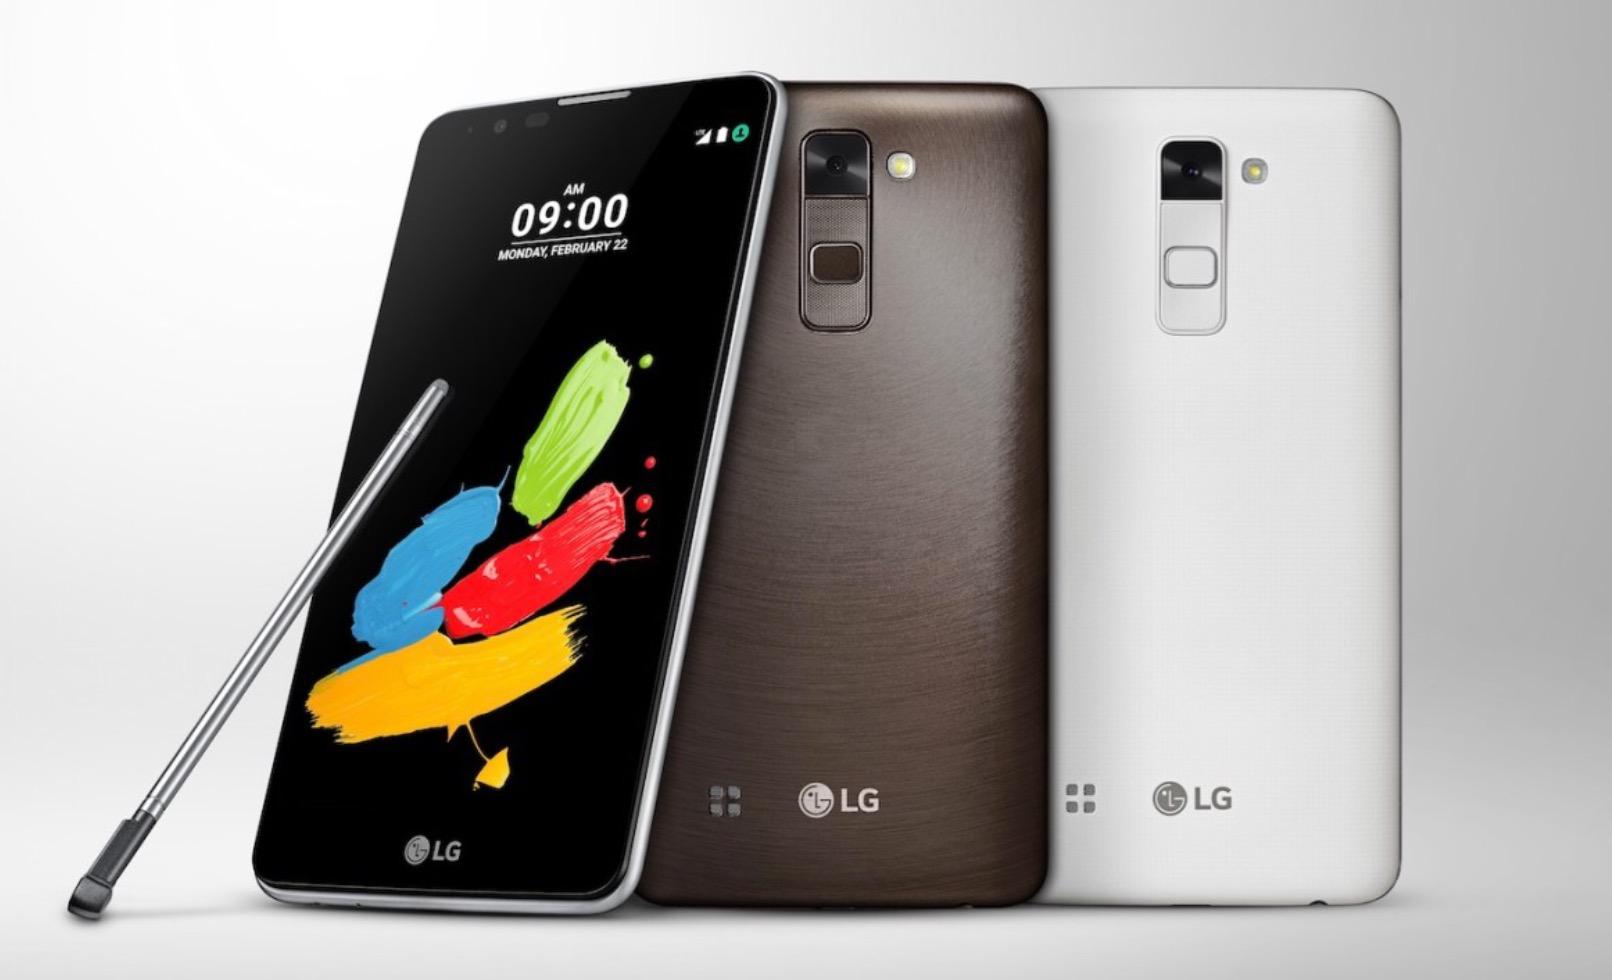 LG Stylus 2 Display And Resolution